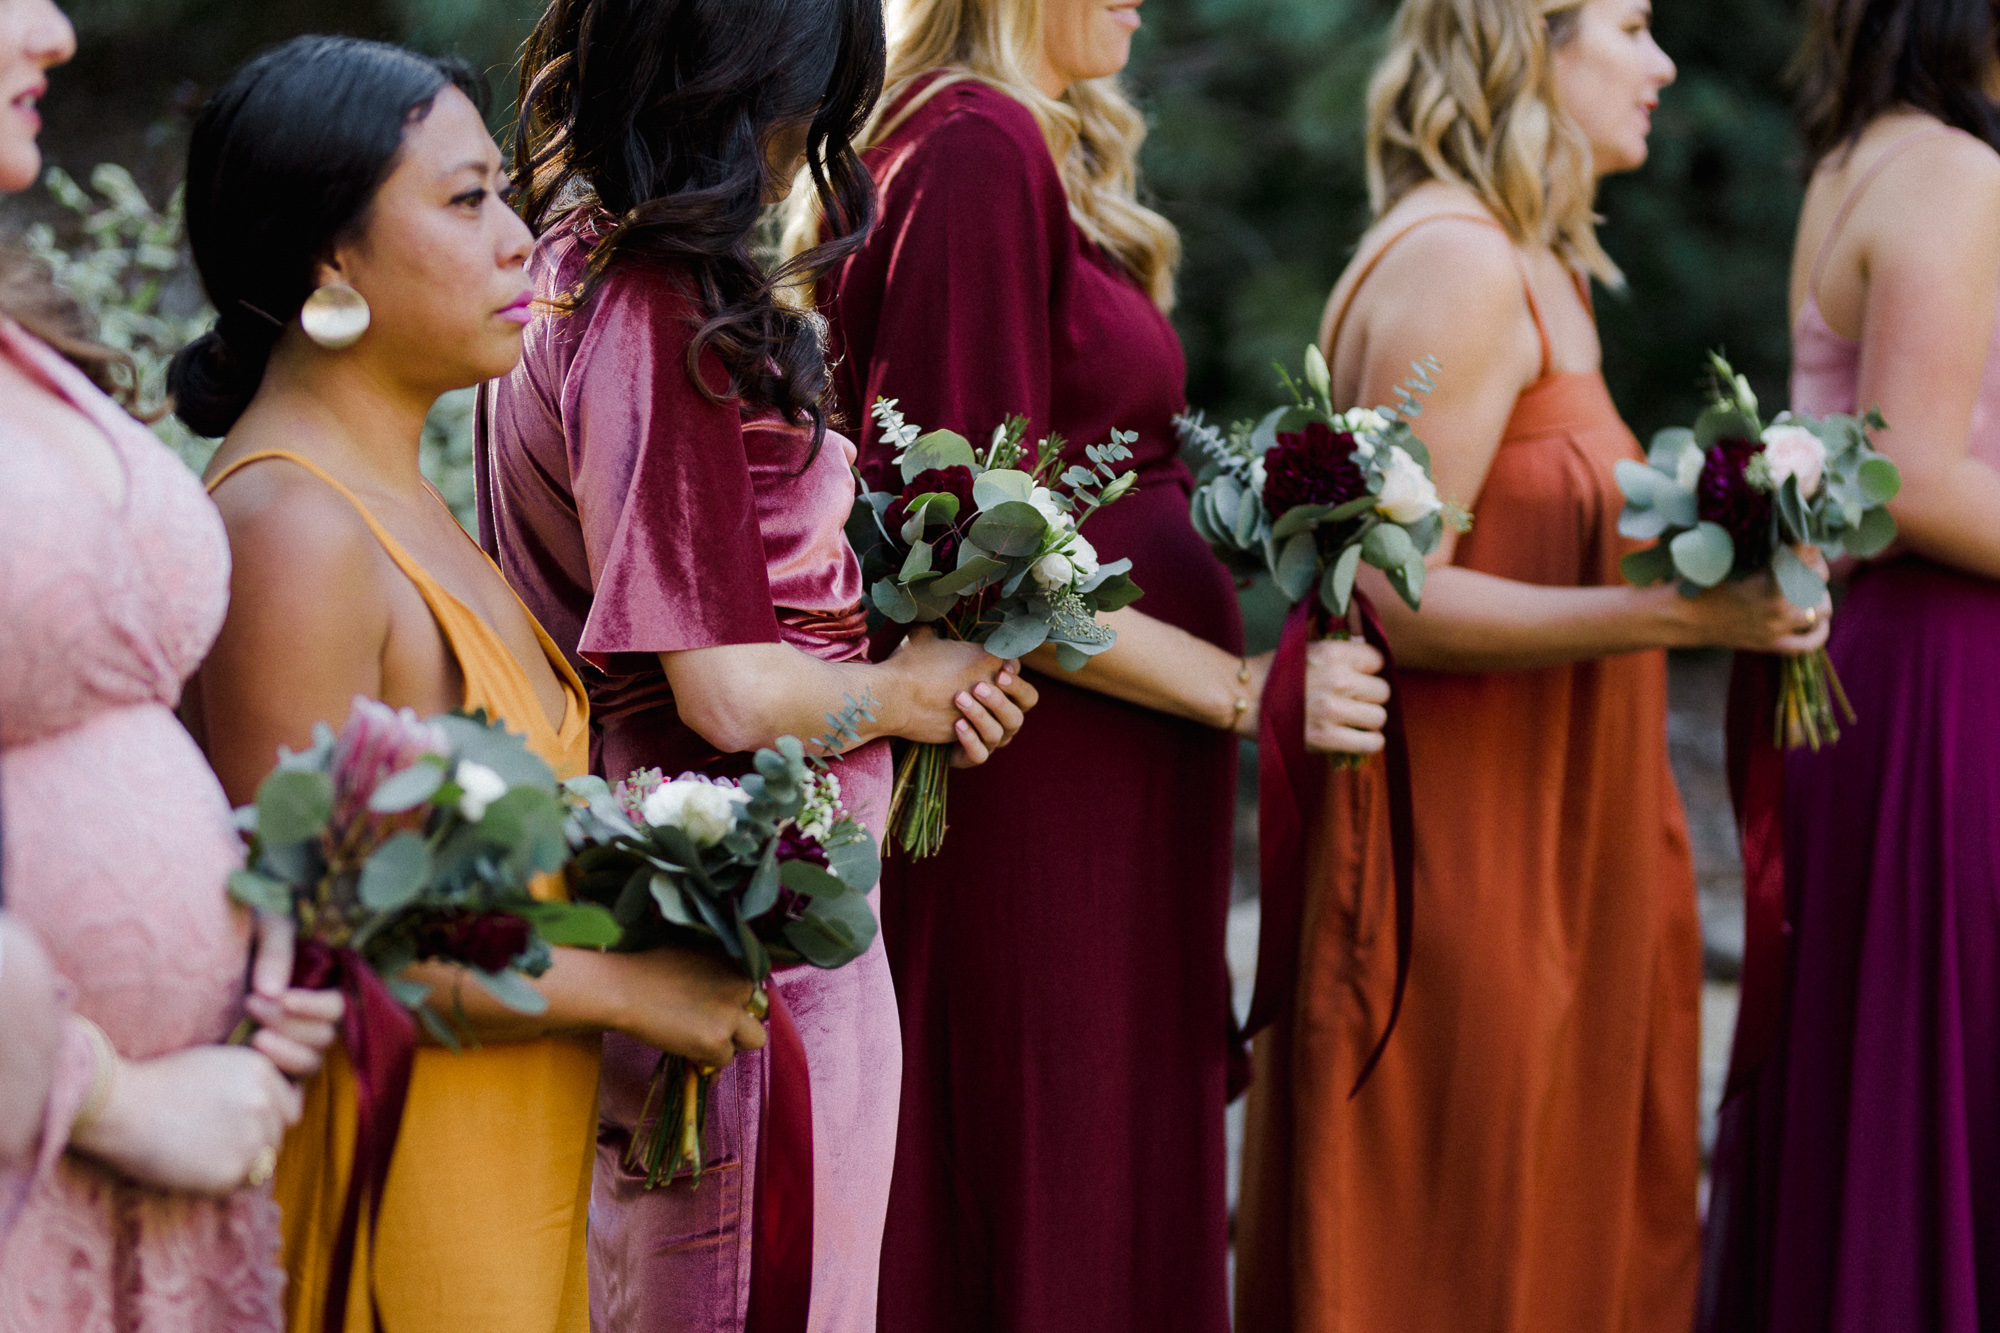 Bridesmaids Holding Flowers.